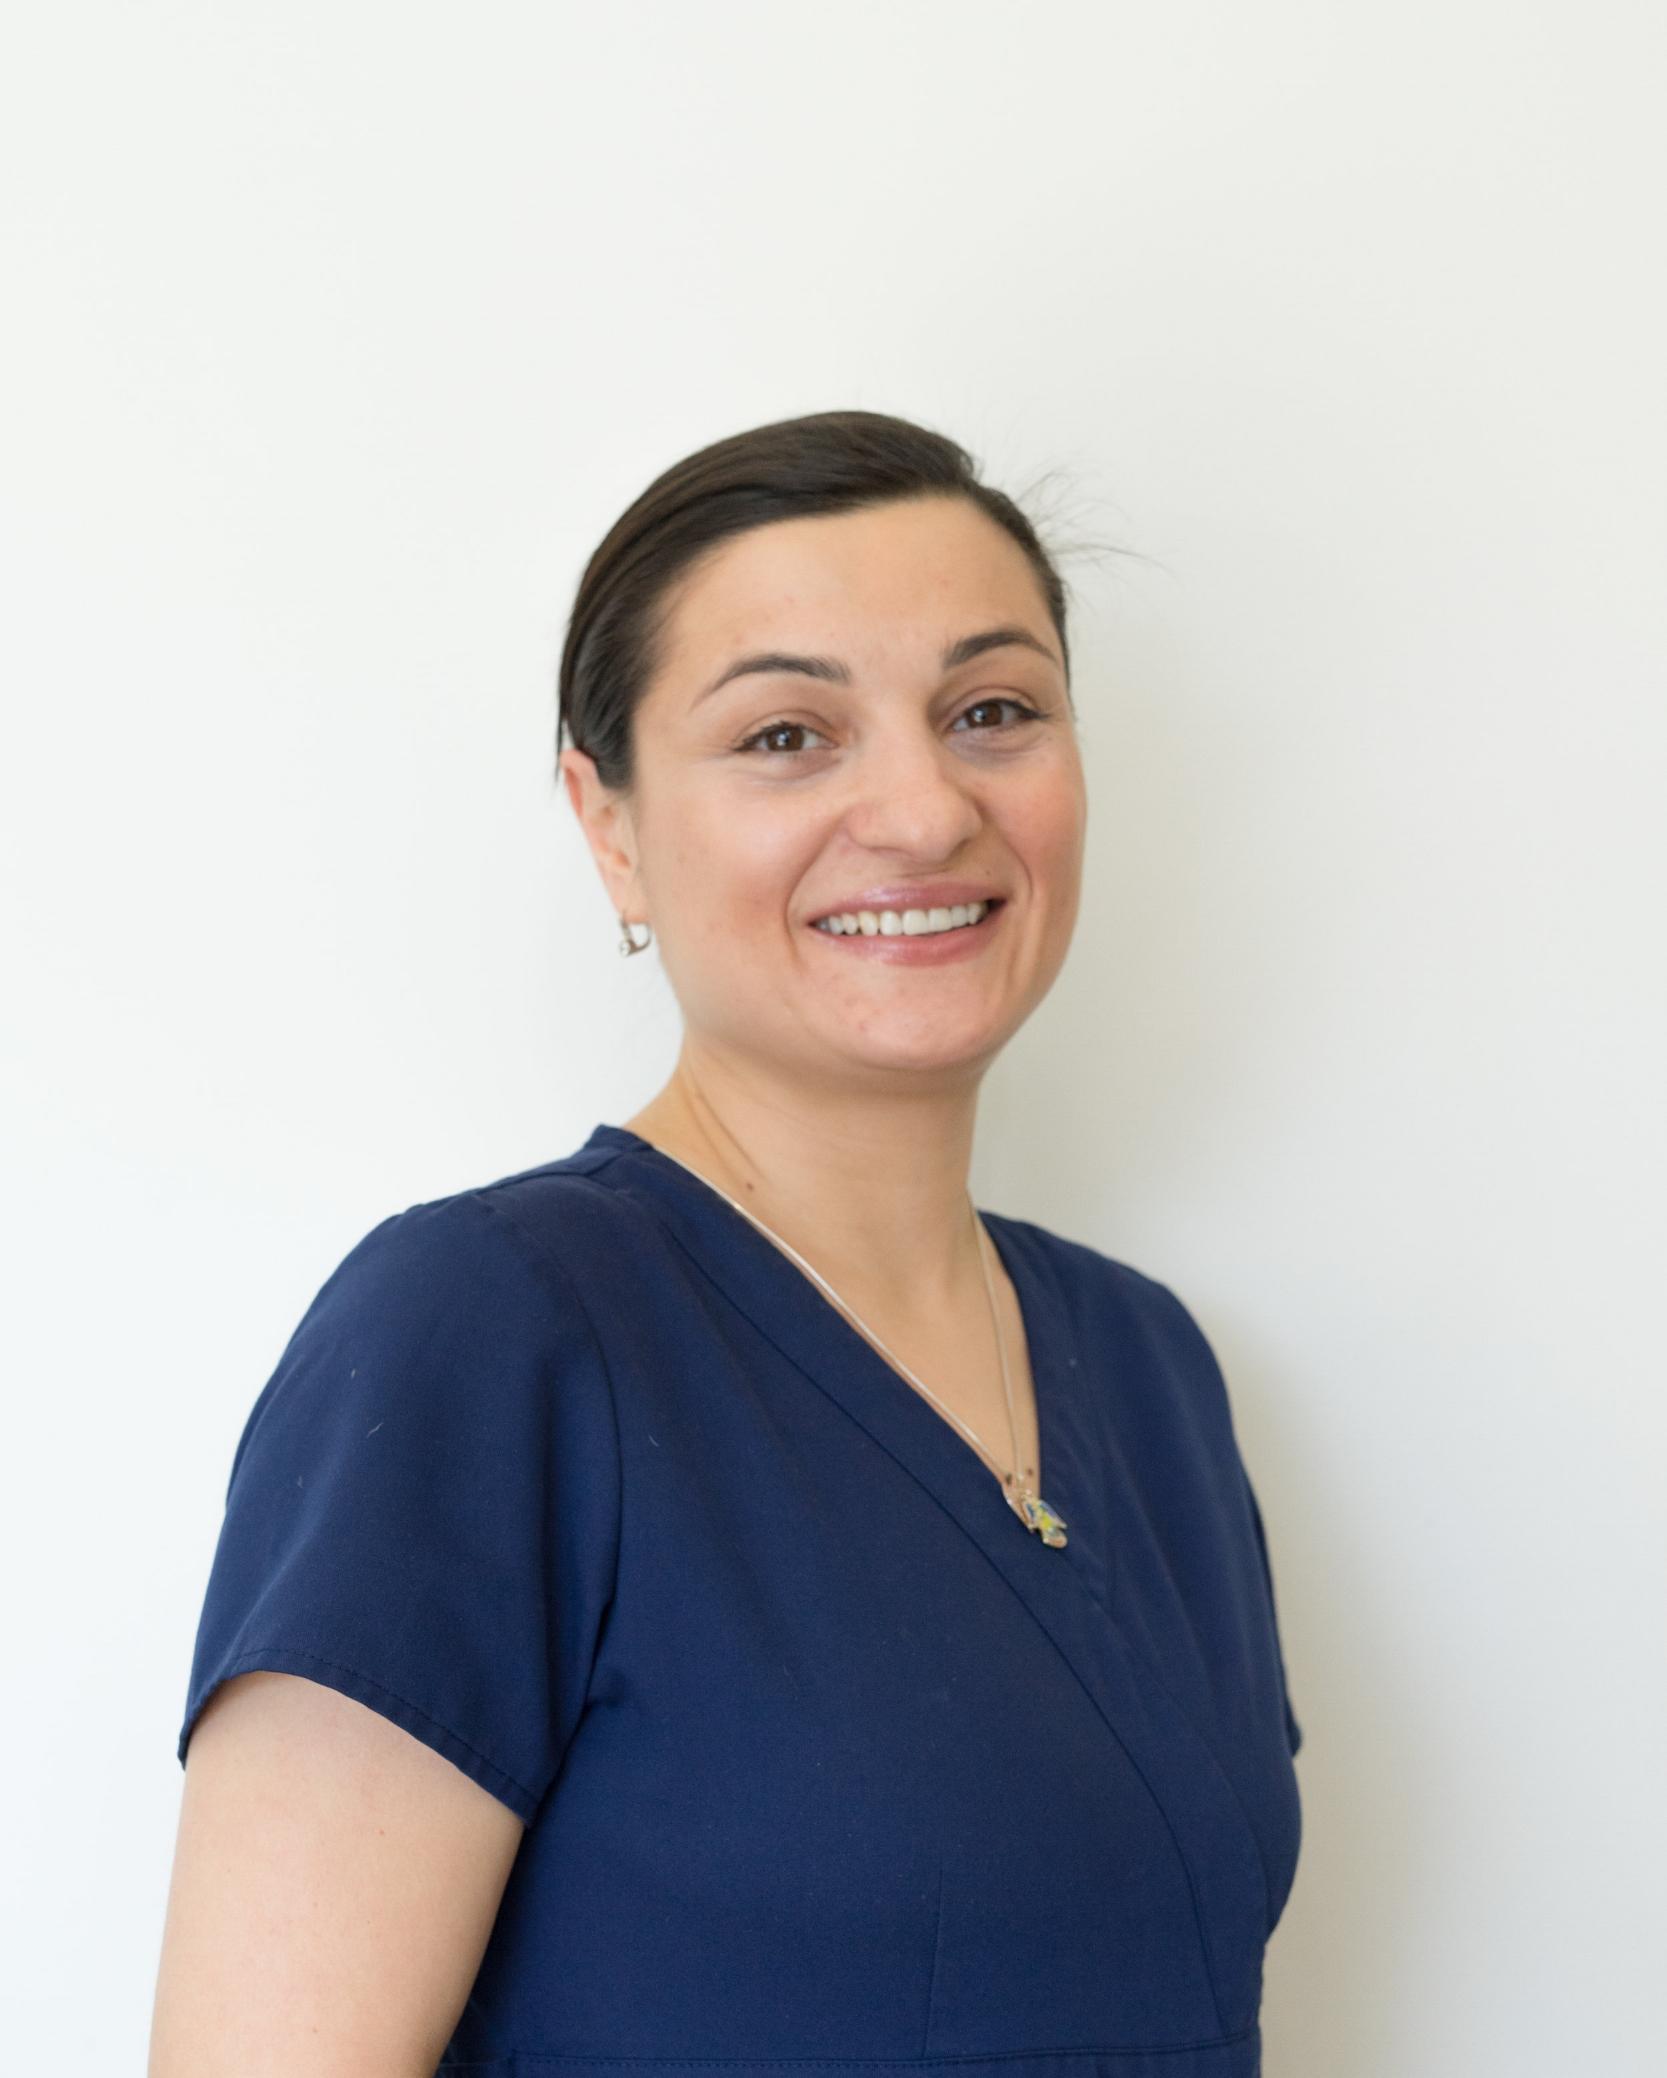 Maia Dolidze, RDA